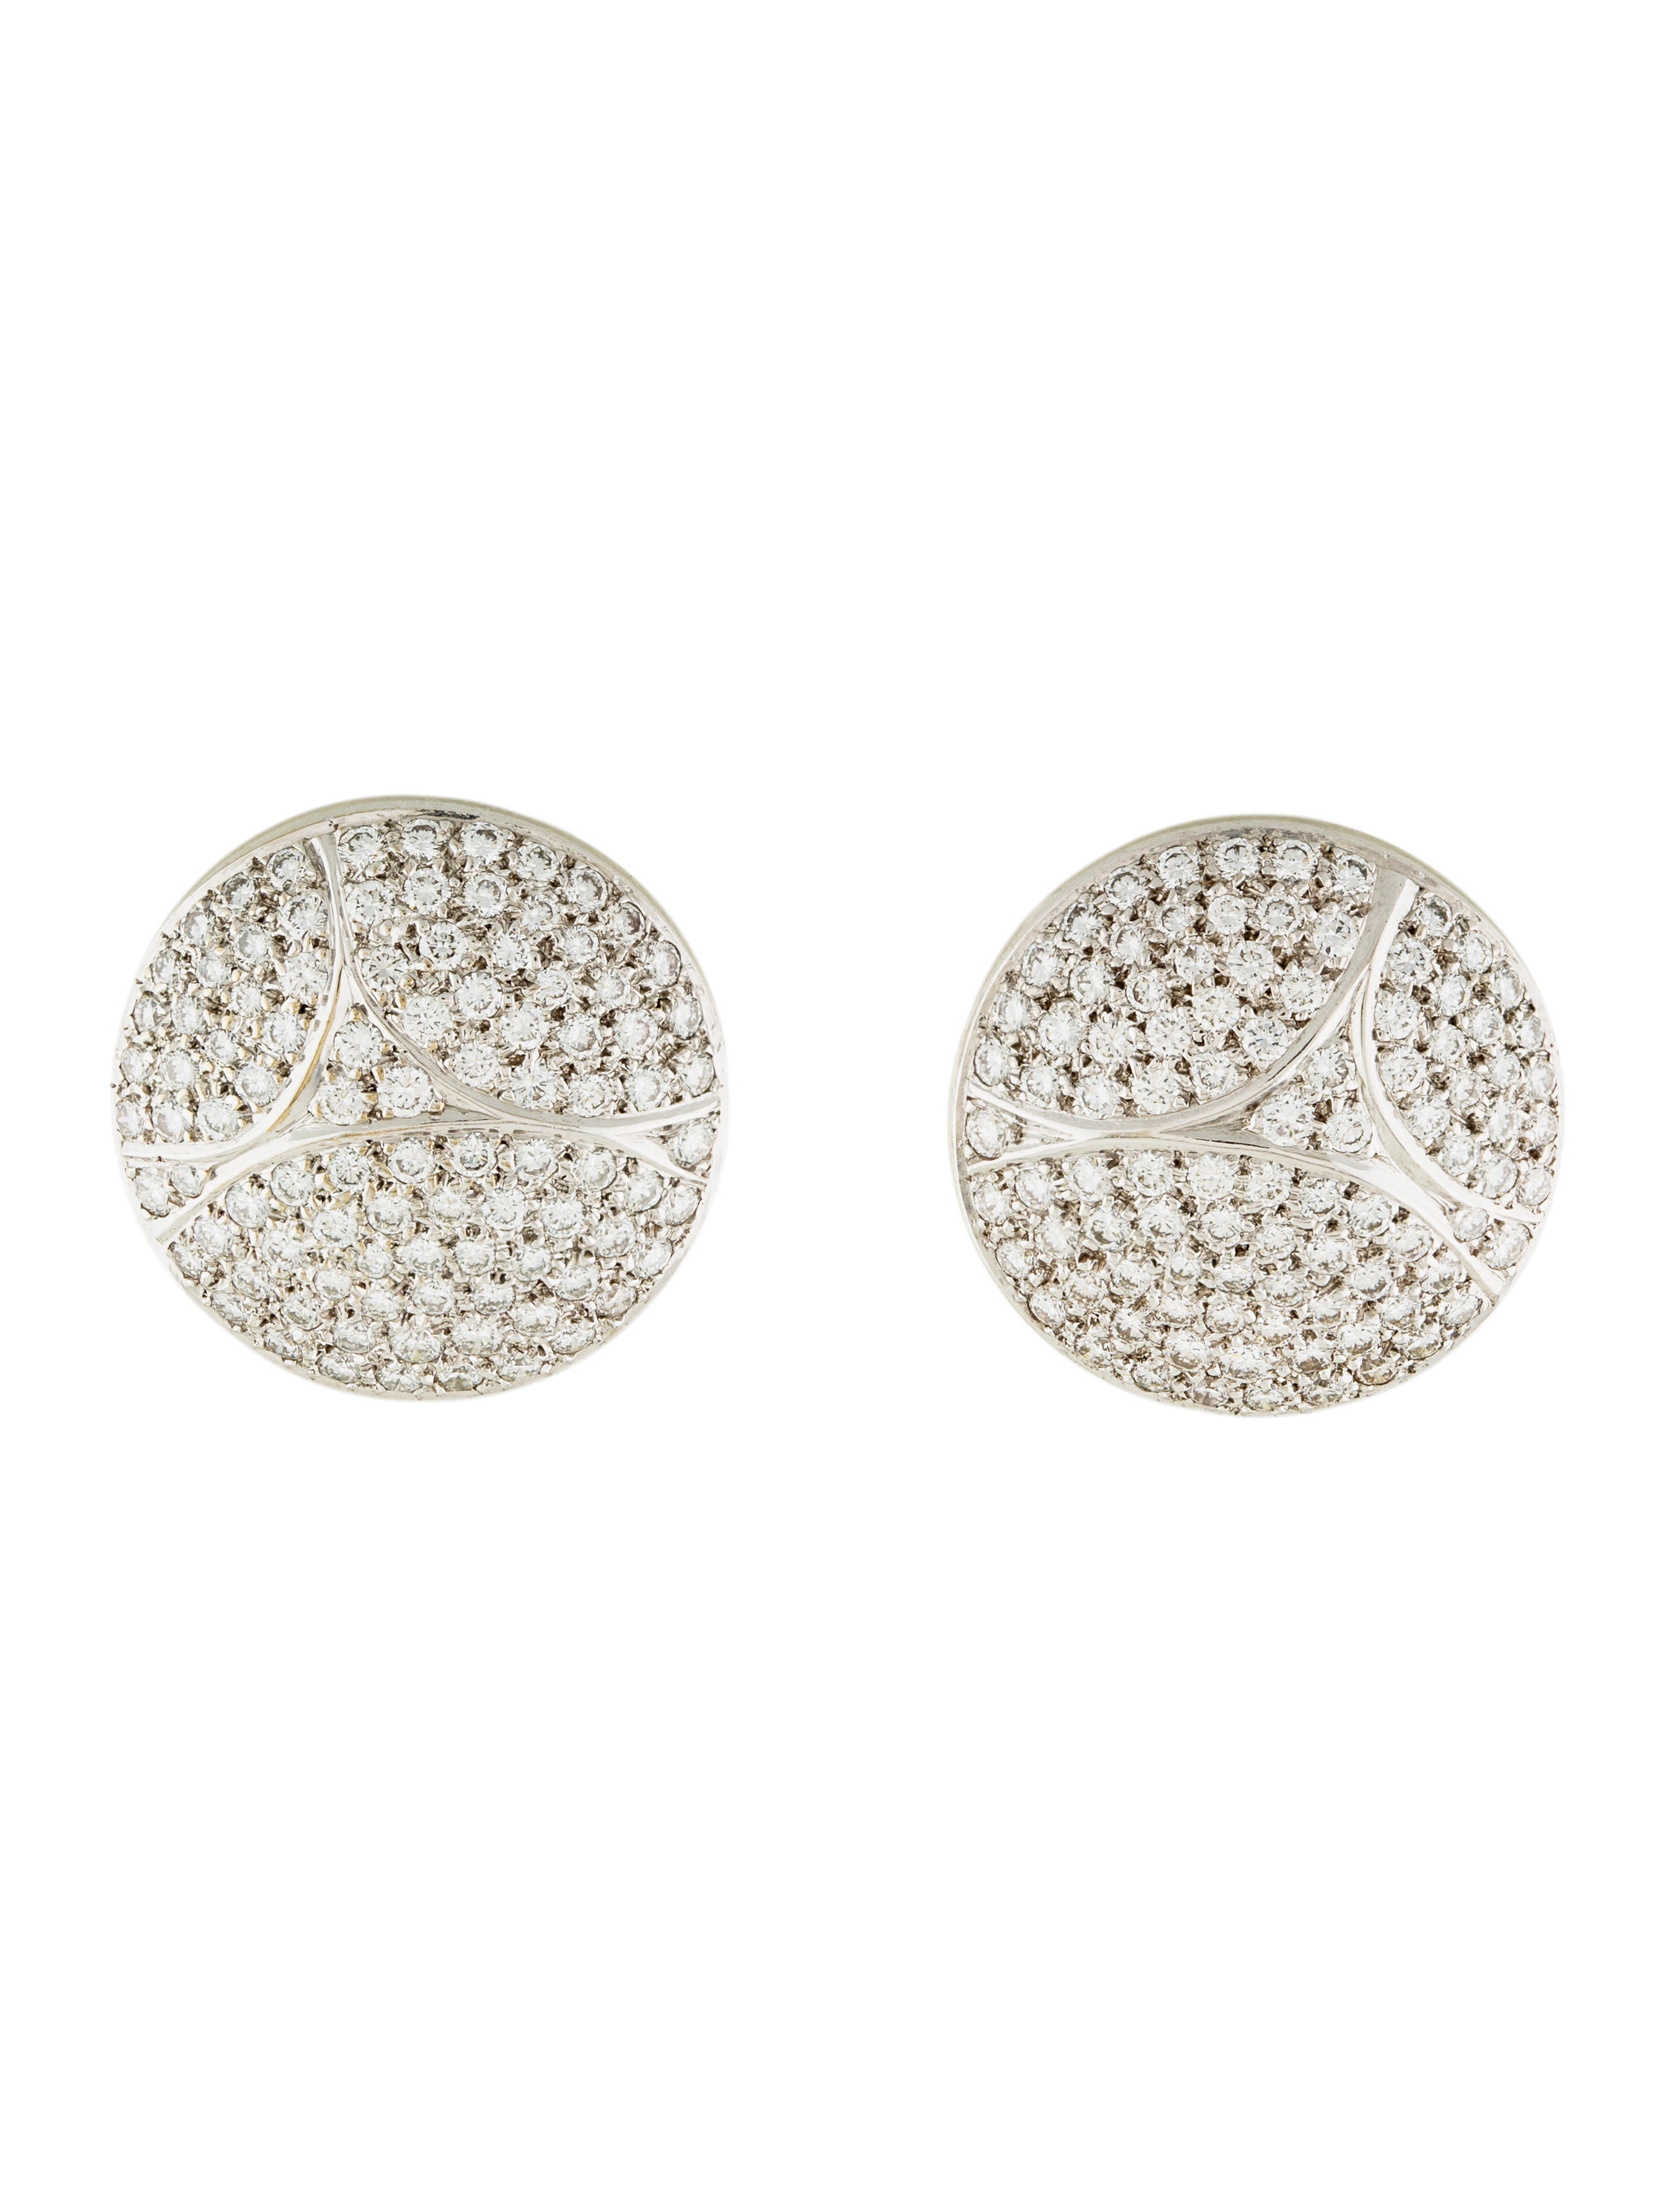 Cartier 18k Pavé Diamond Disc Earrings Crt32152 The Realreal